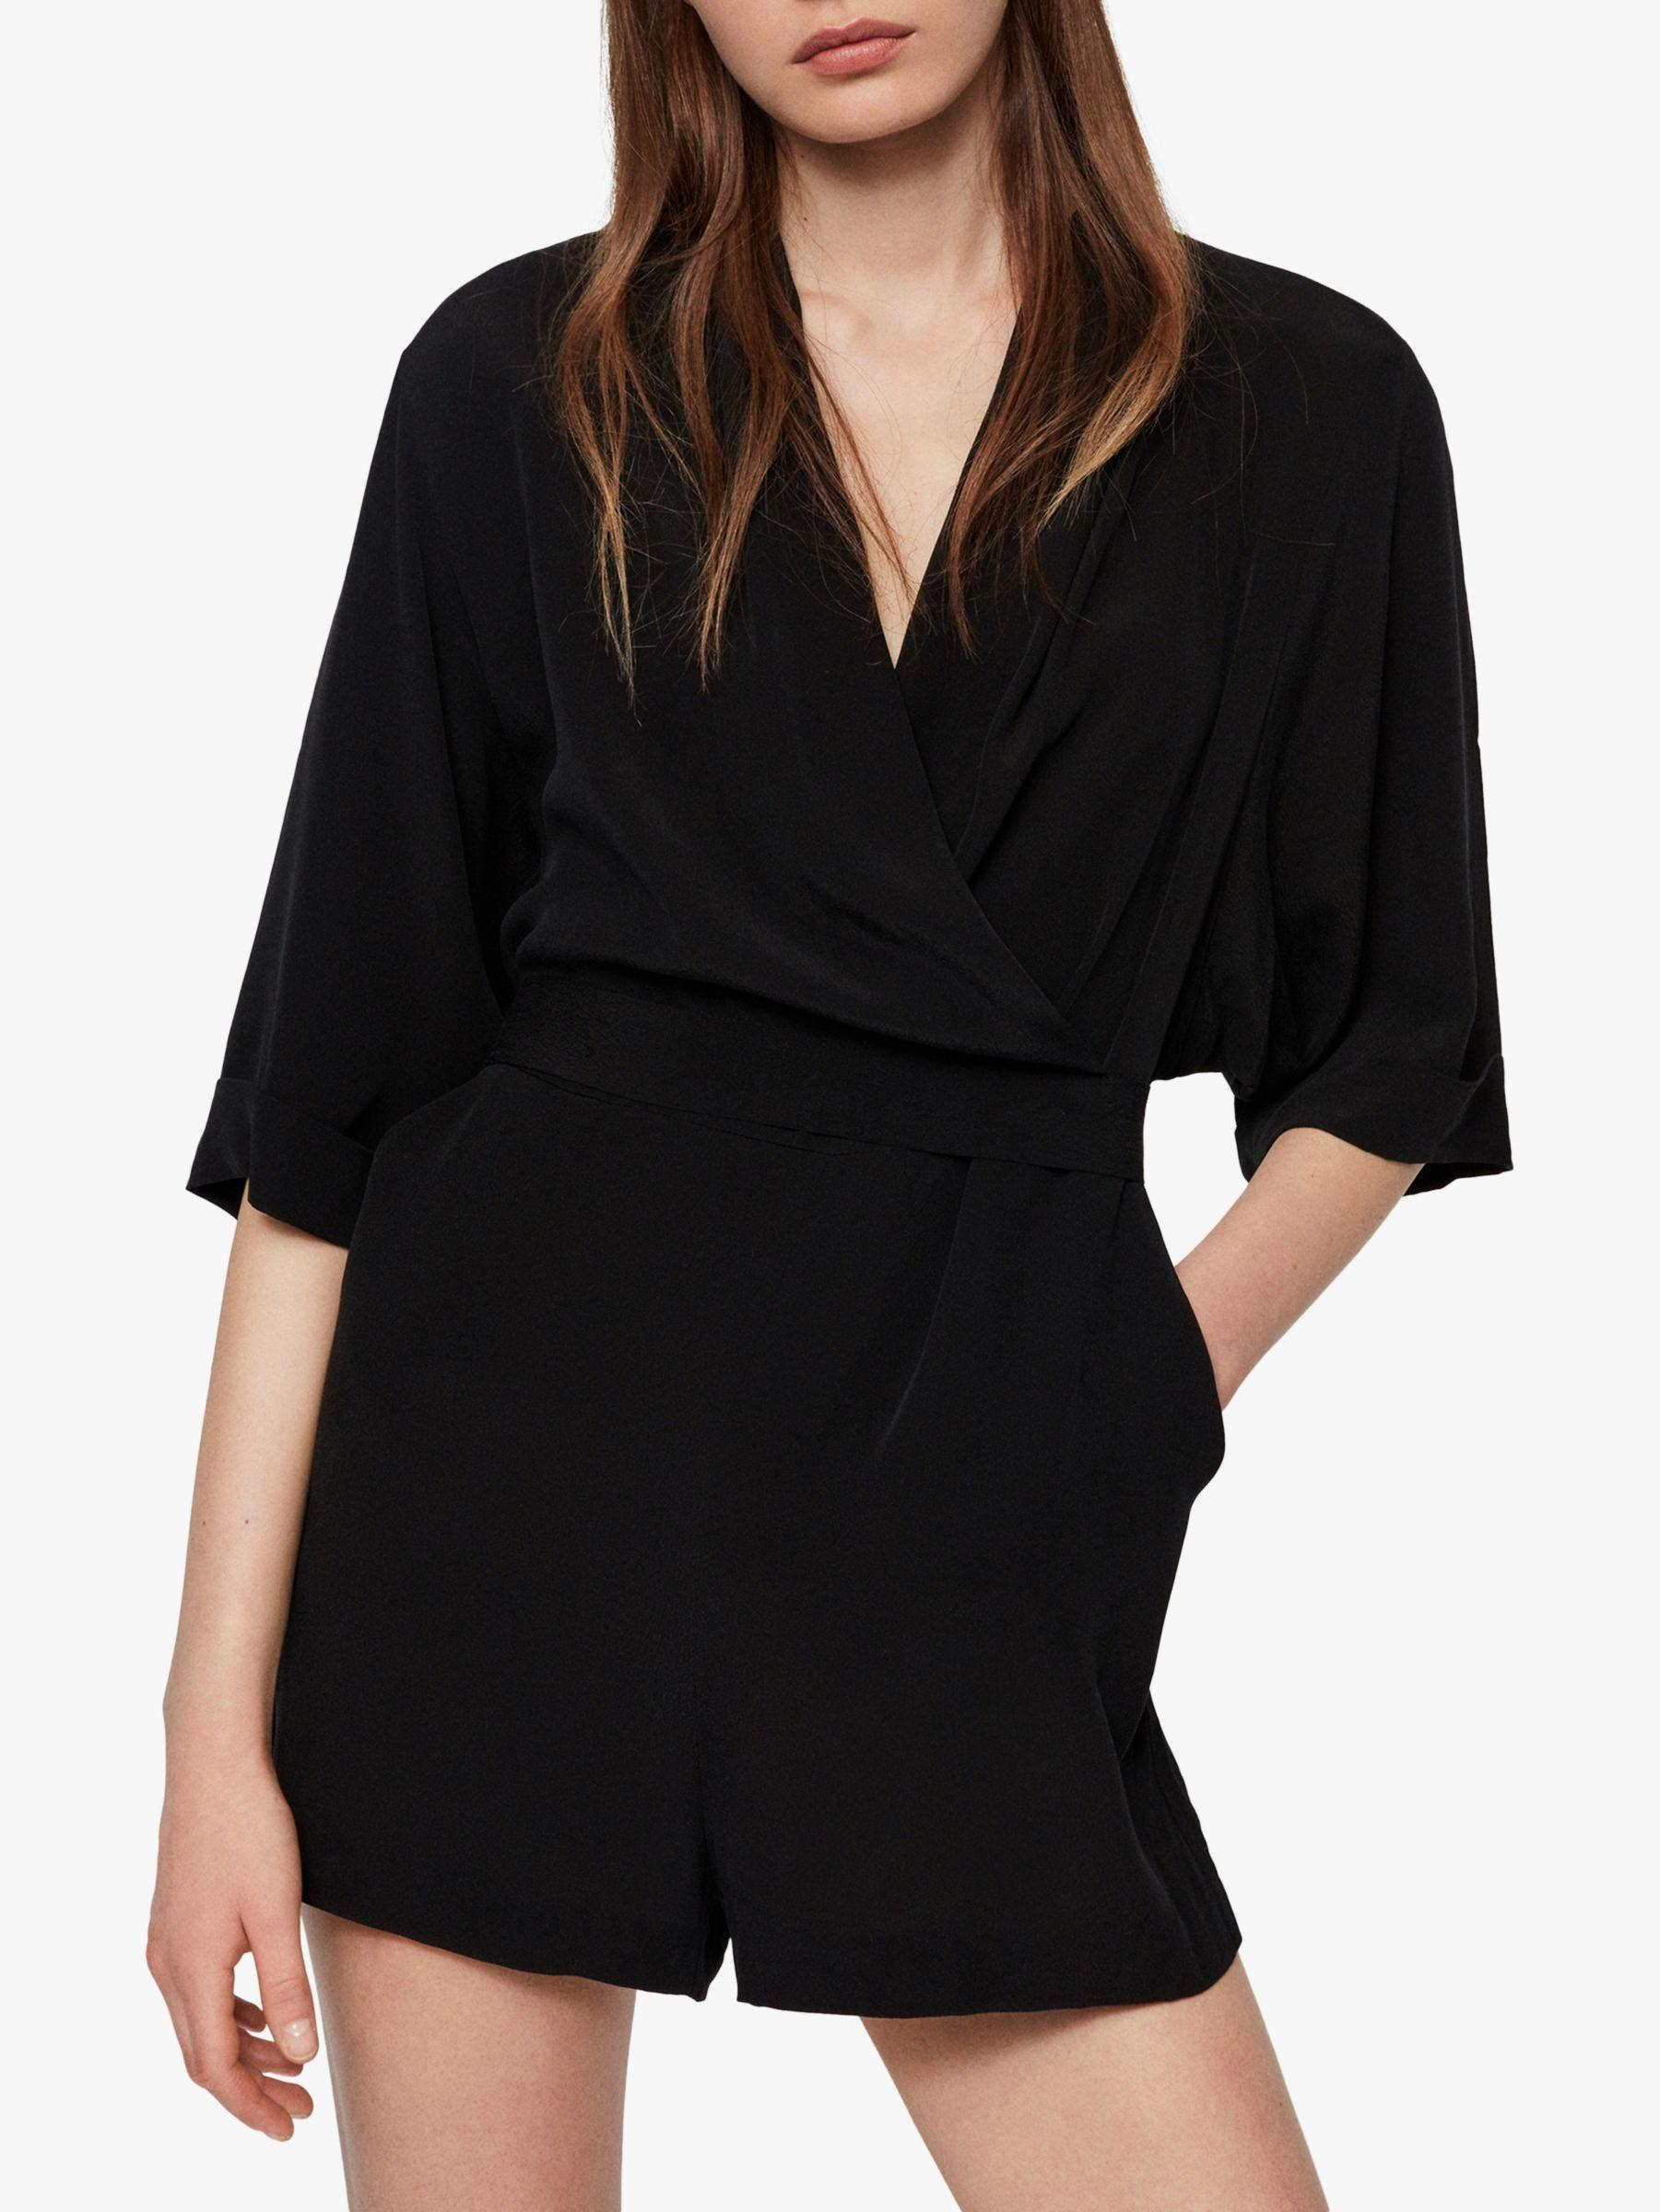 0047be3838 AllSaints Laurel Playsuit in Black - Lyst